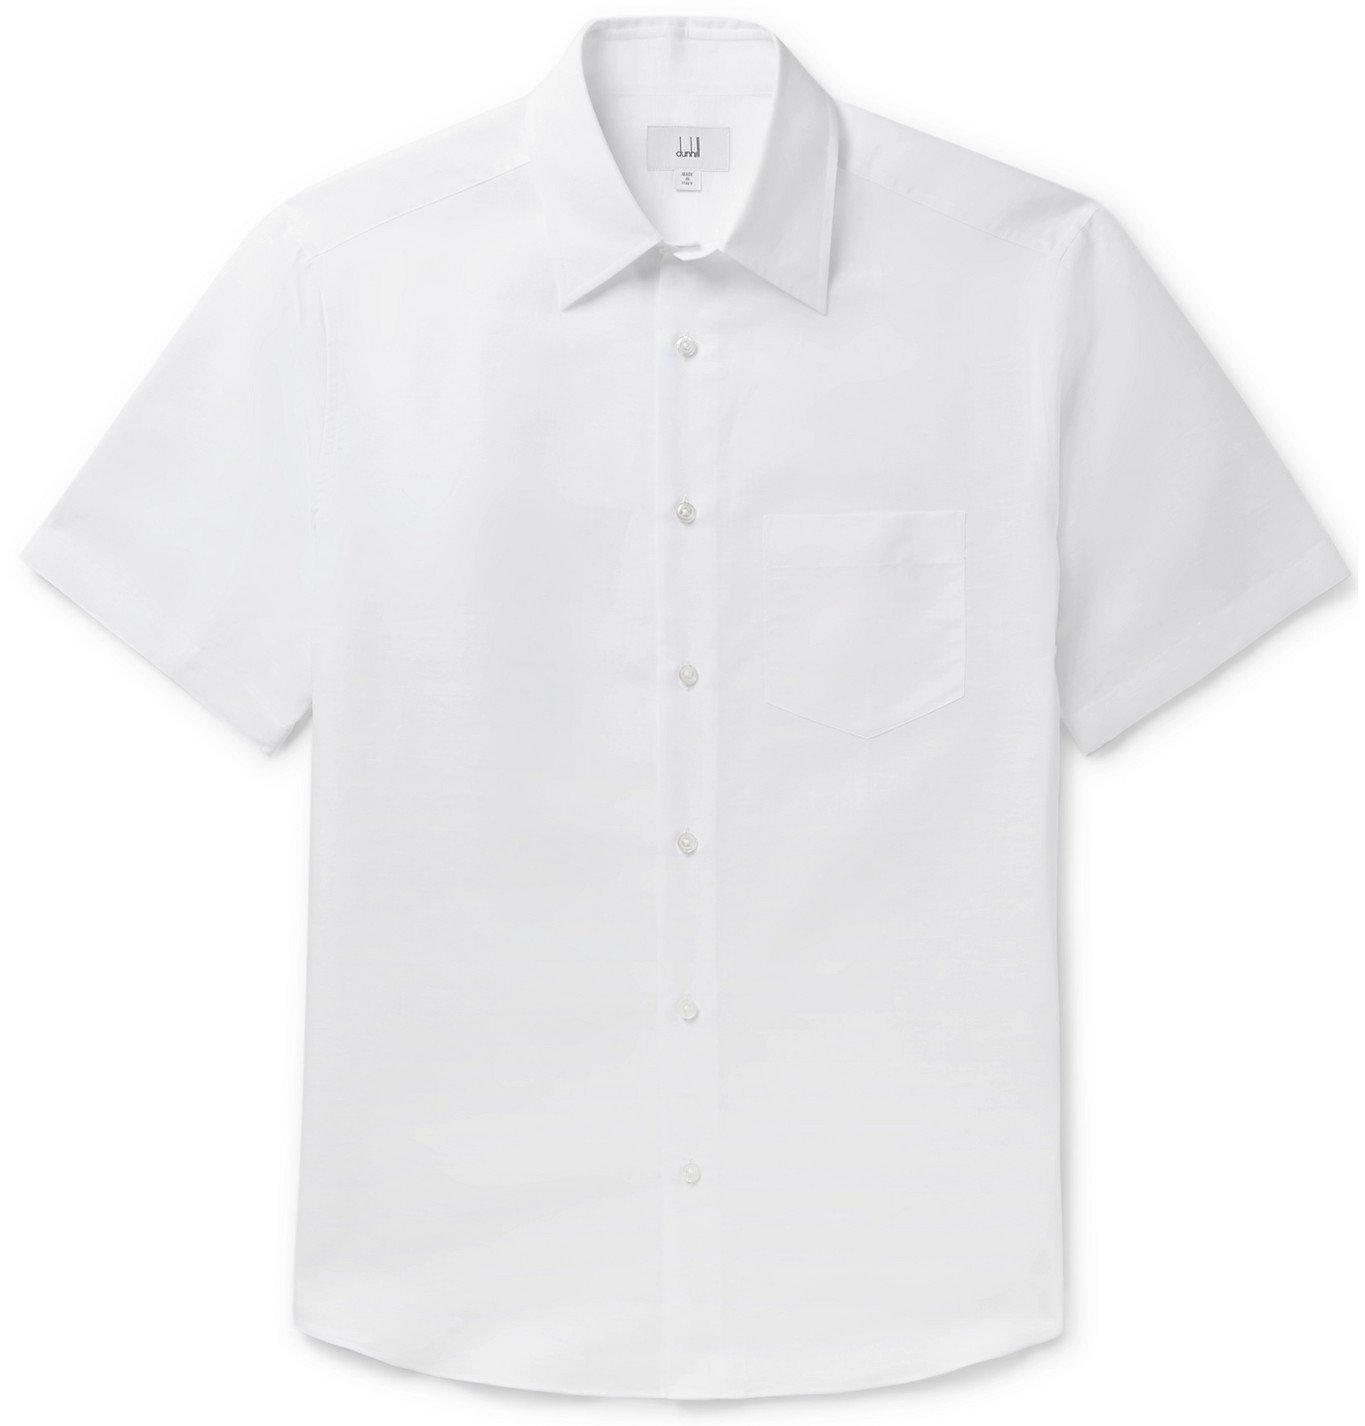 Dunhill - Linen and Cotton-Blend Shirt - White